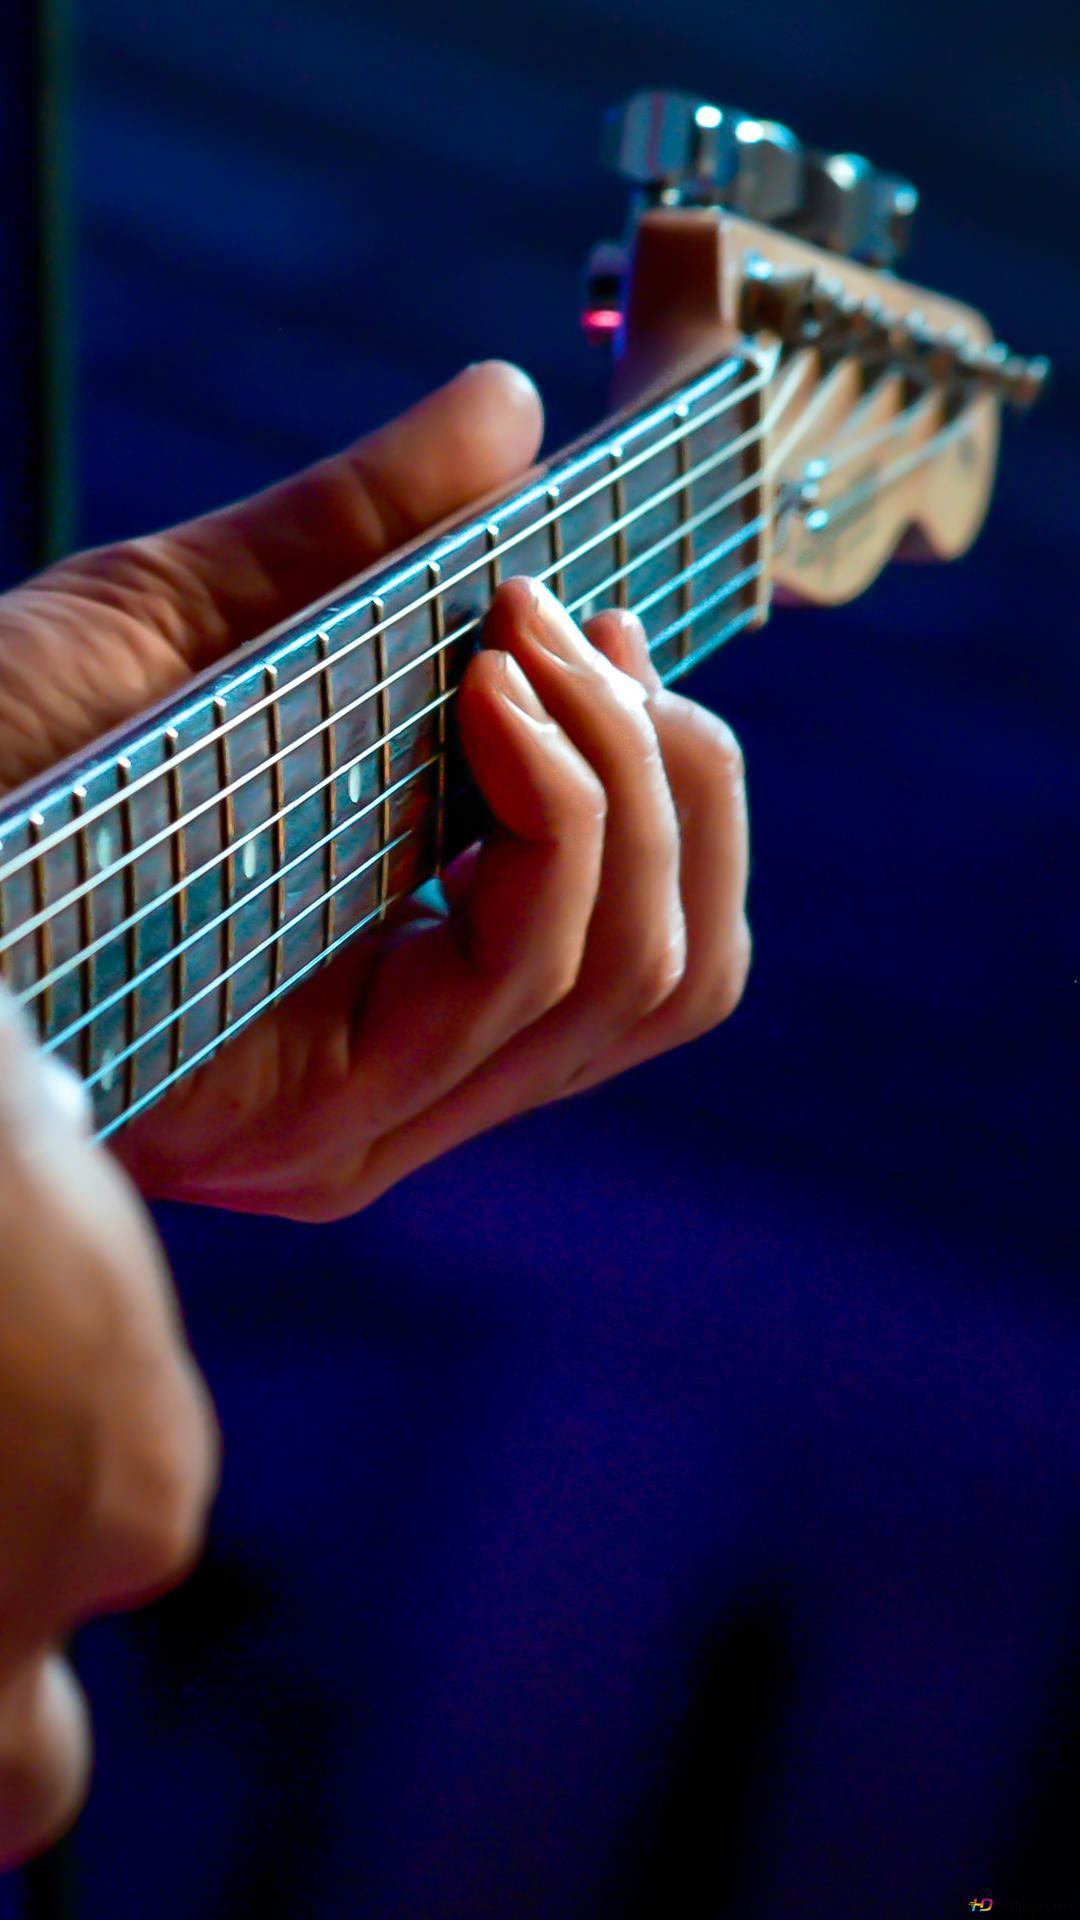 Guitarist Playing Electric Guitar Hd Wallpaper Download